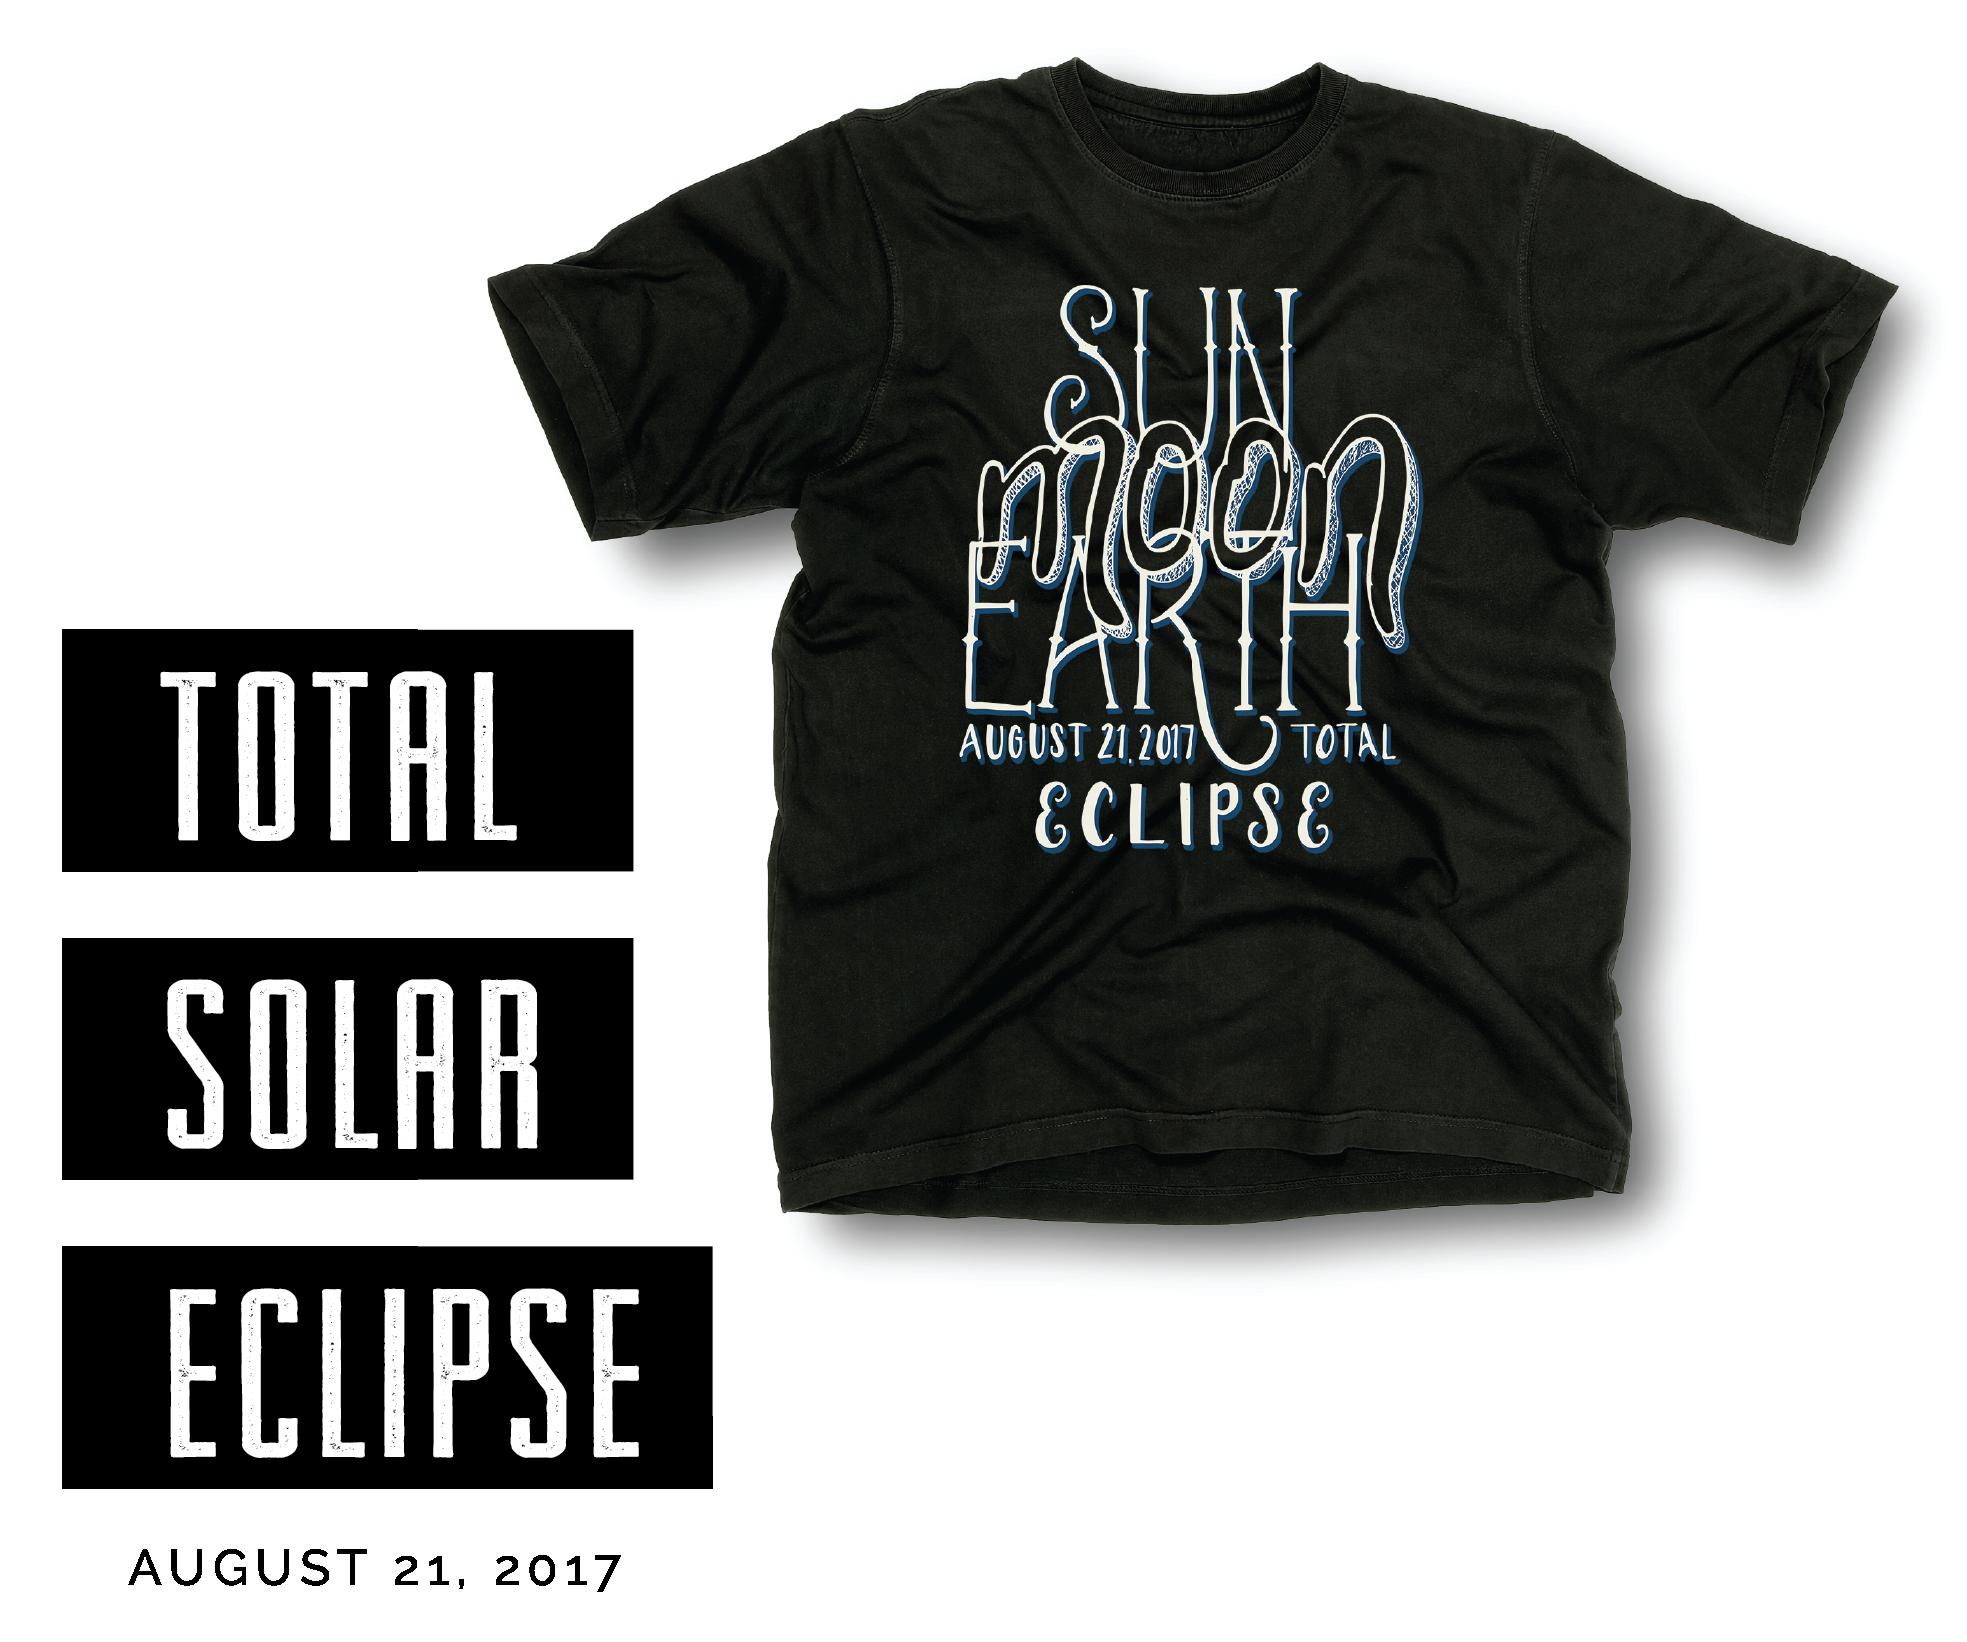 Solar Eclipse Hand Lettering T Shirt Design T Shirt Design